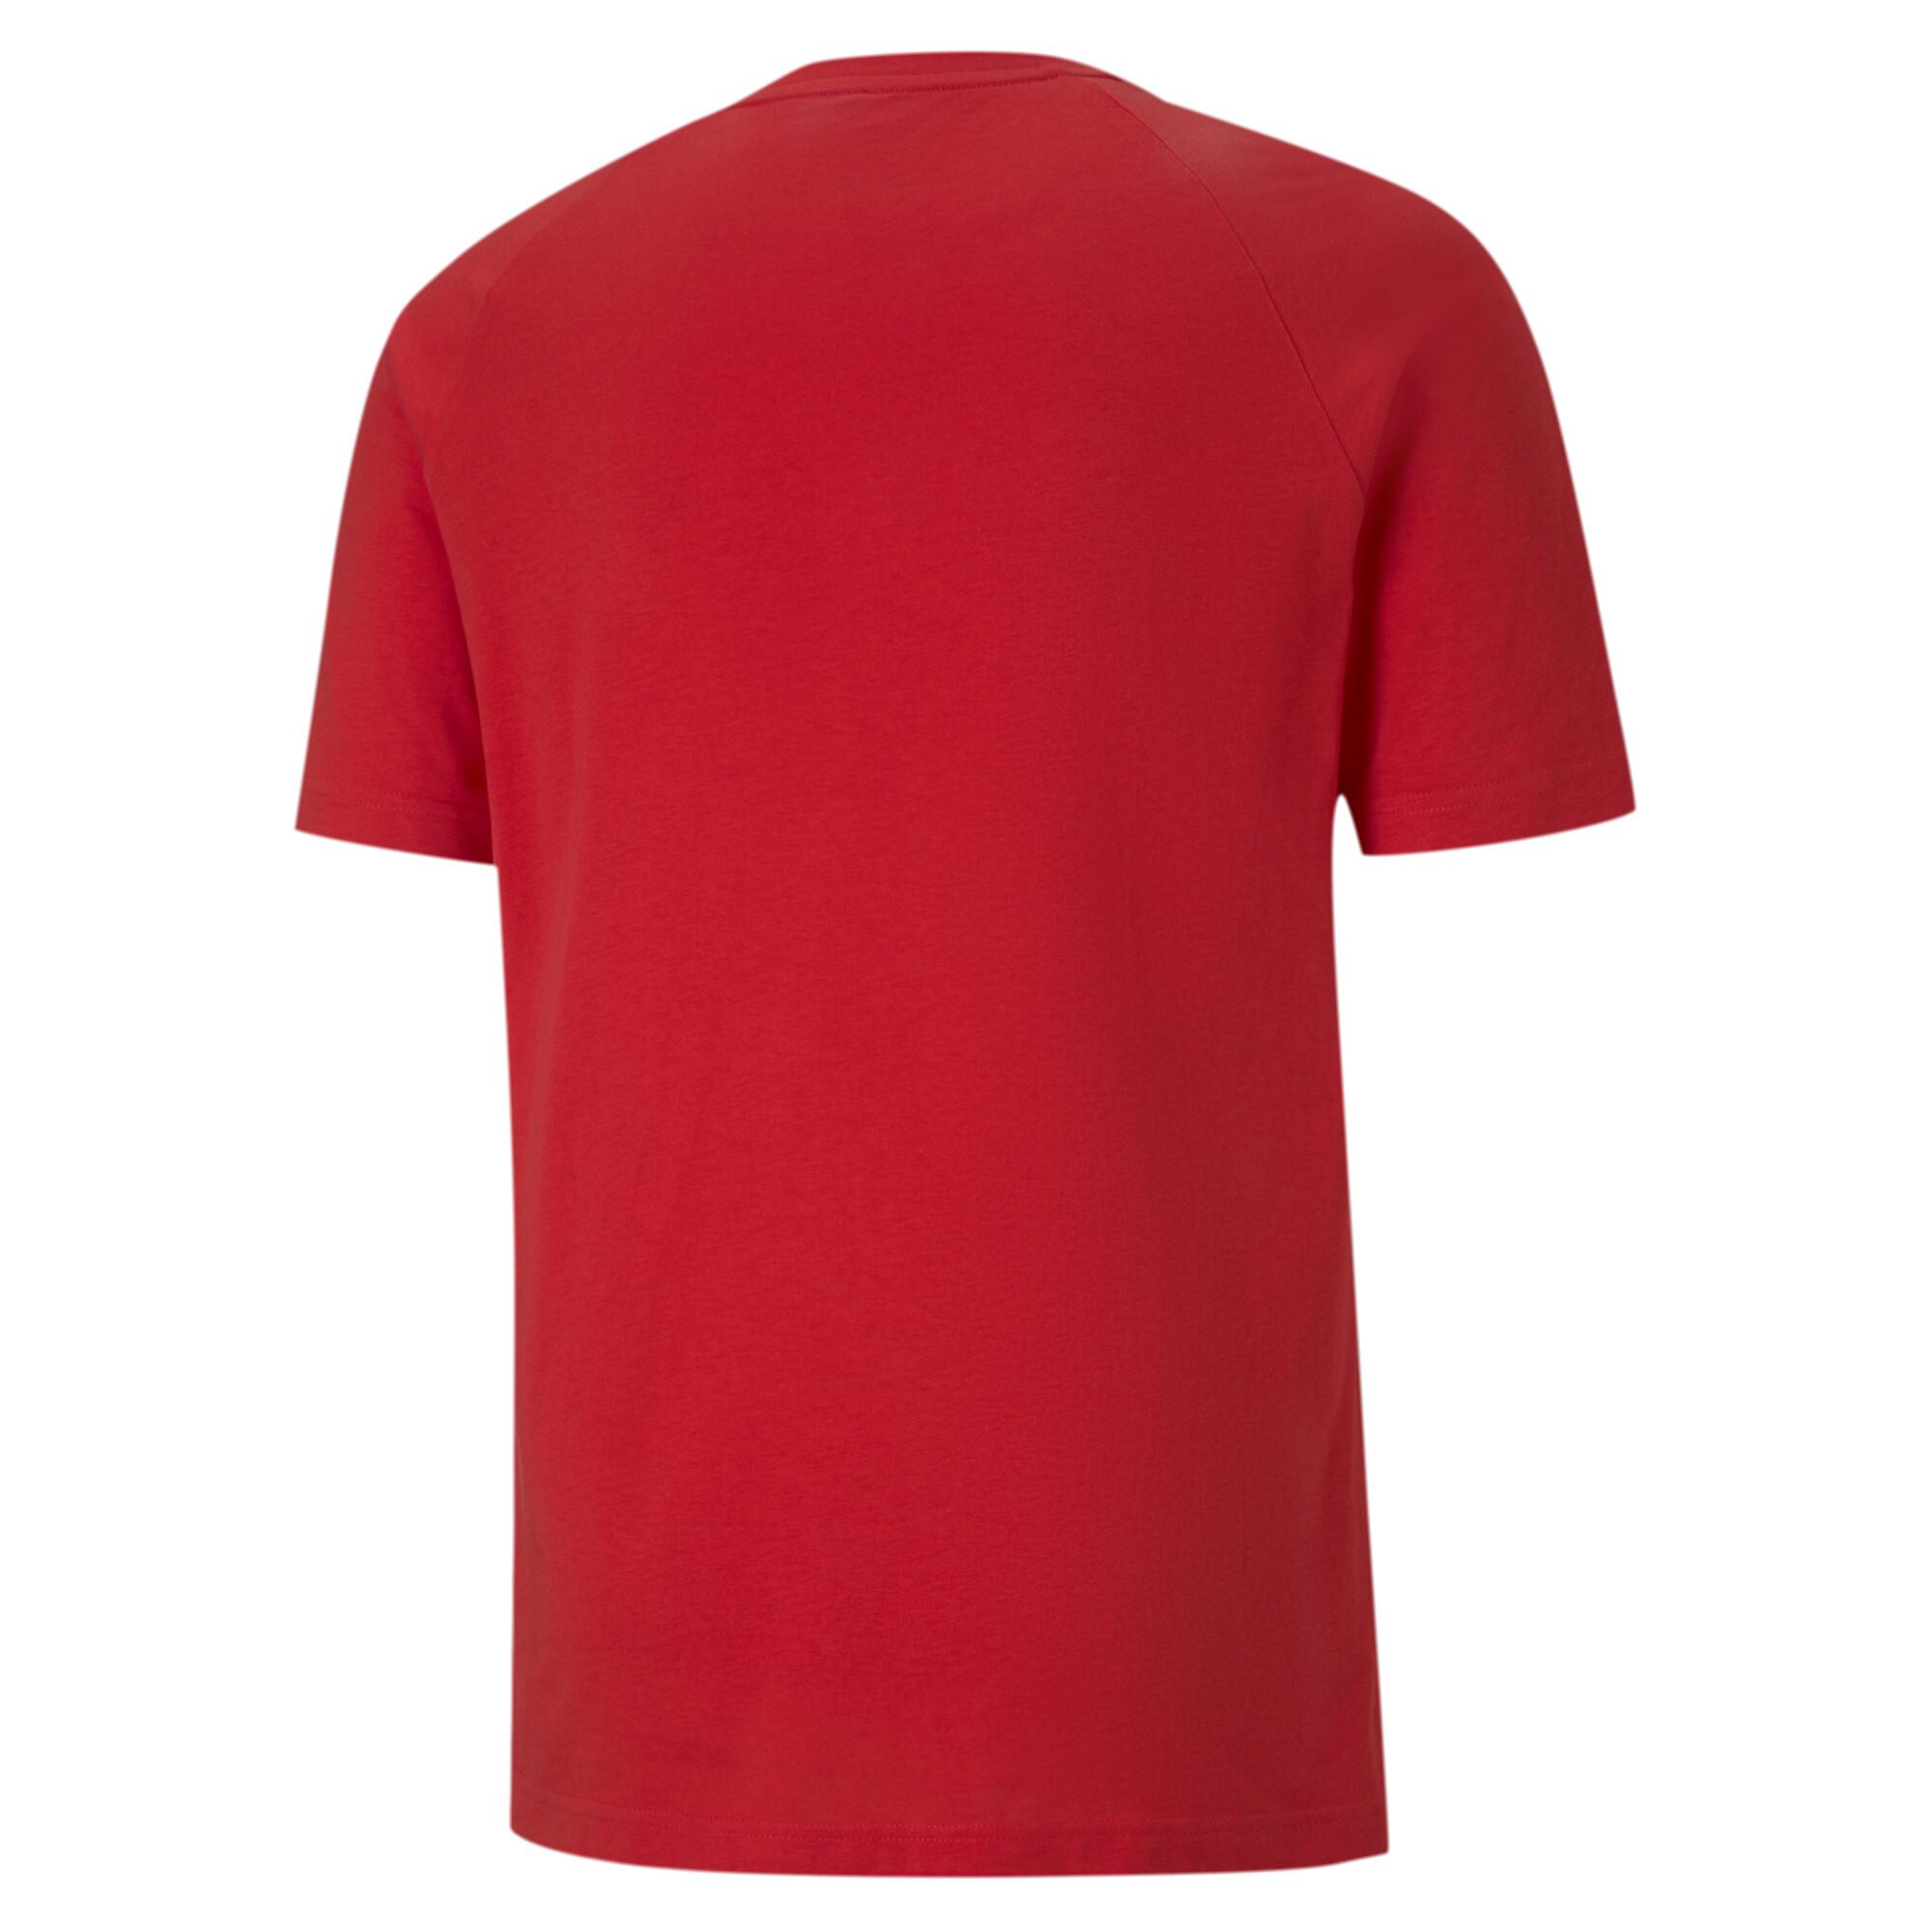 PUMA-Modern-Sports-Men-039-s-Logo-Tee-Men-Tee-Basics thumbnail 6